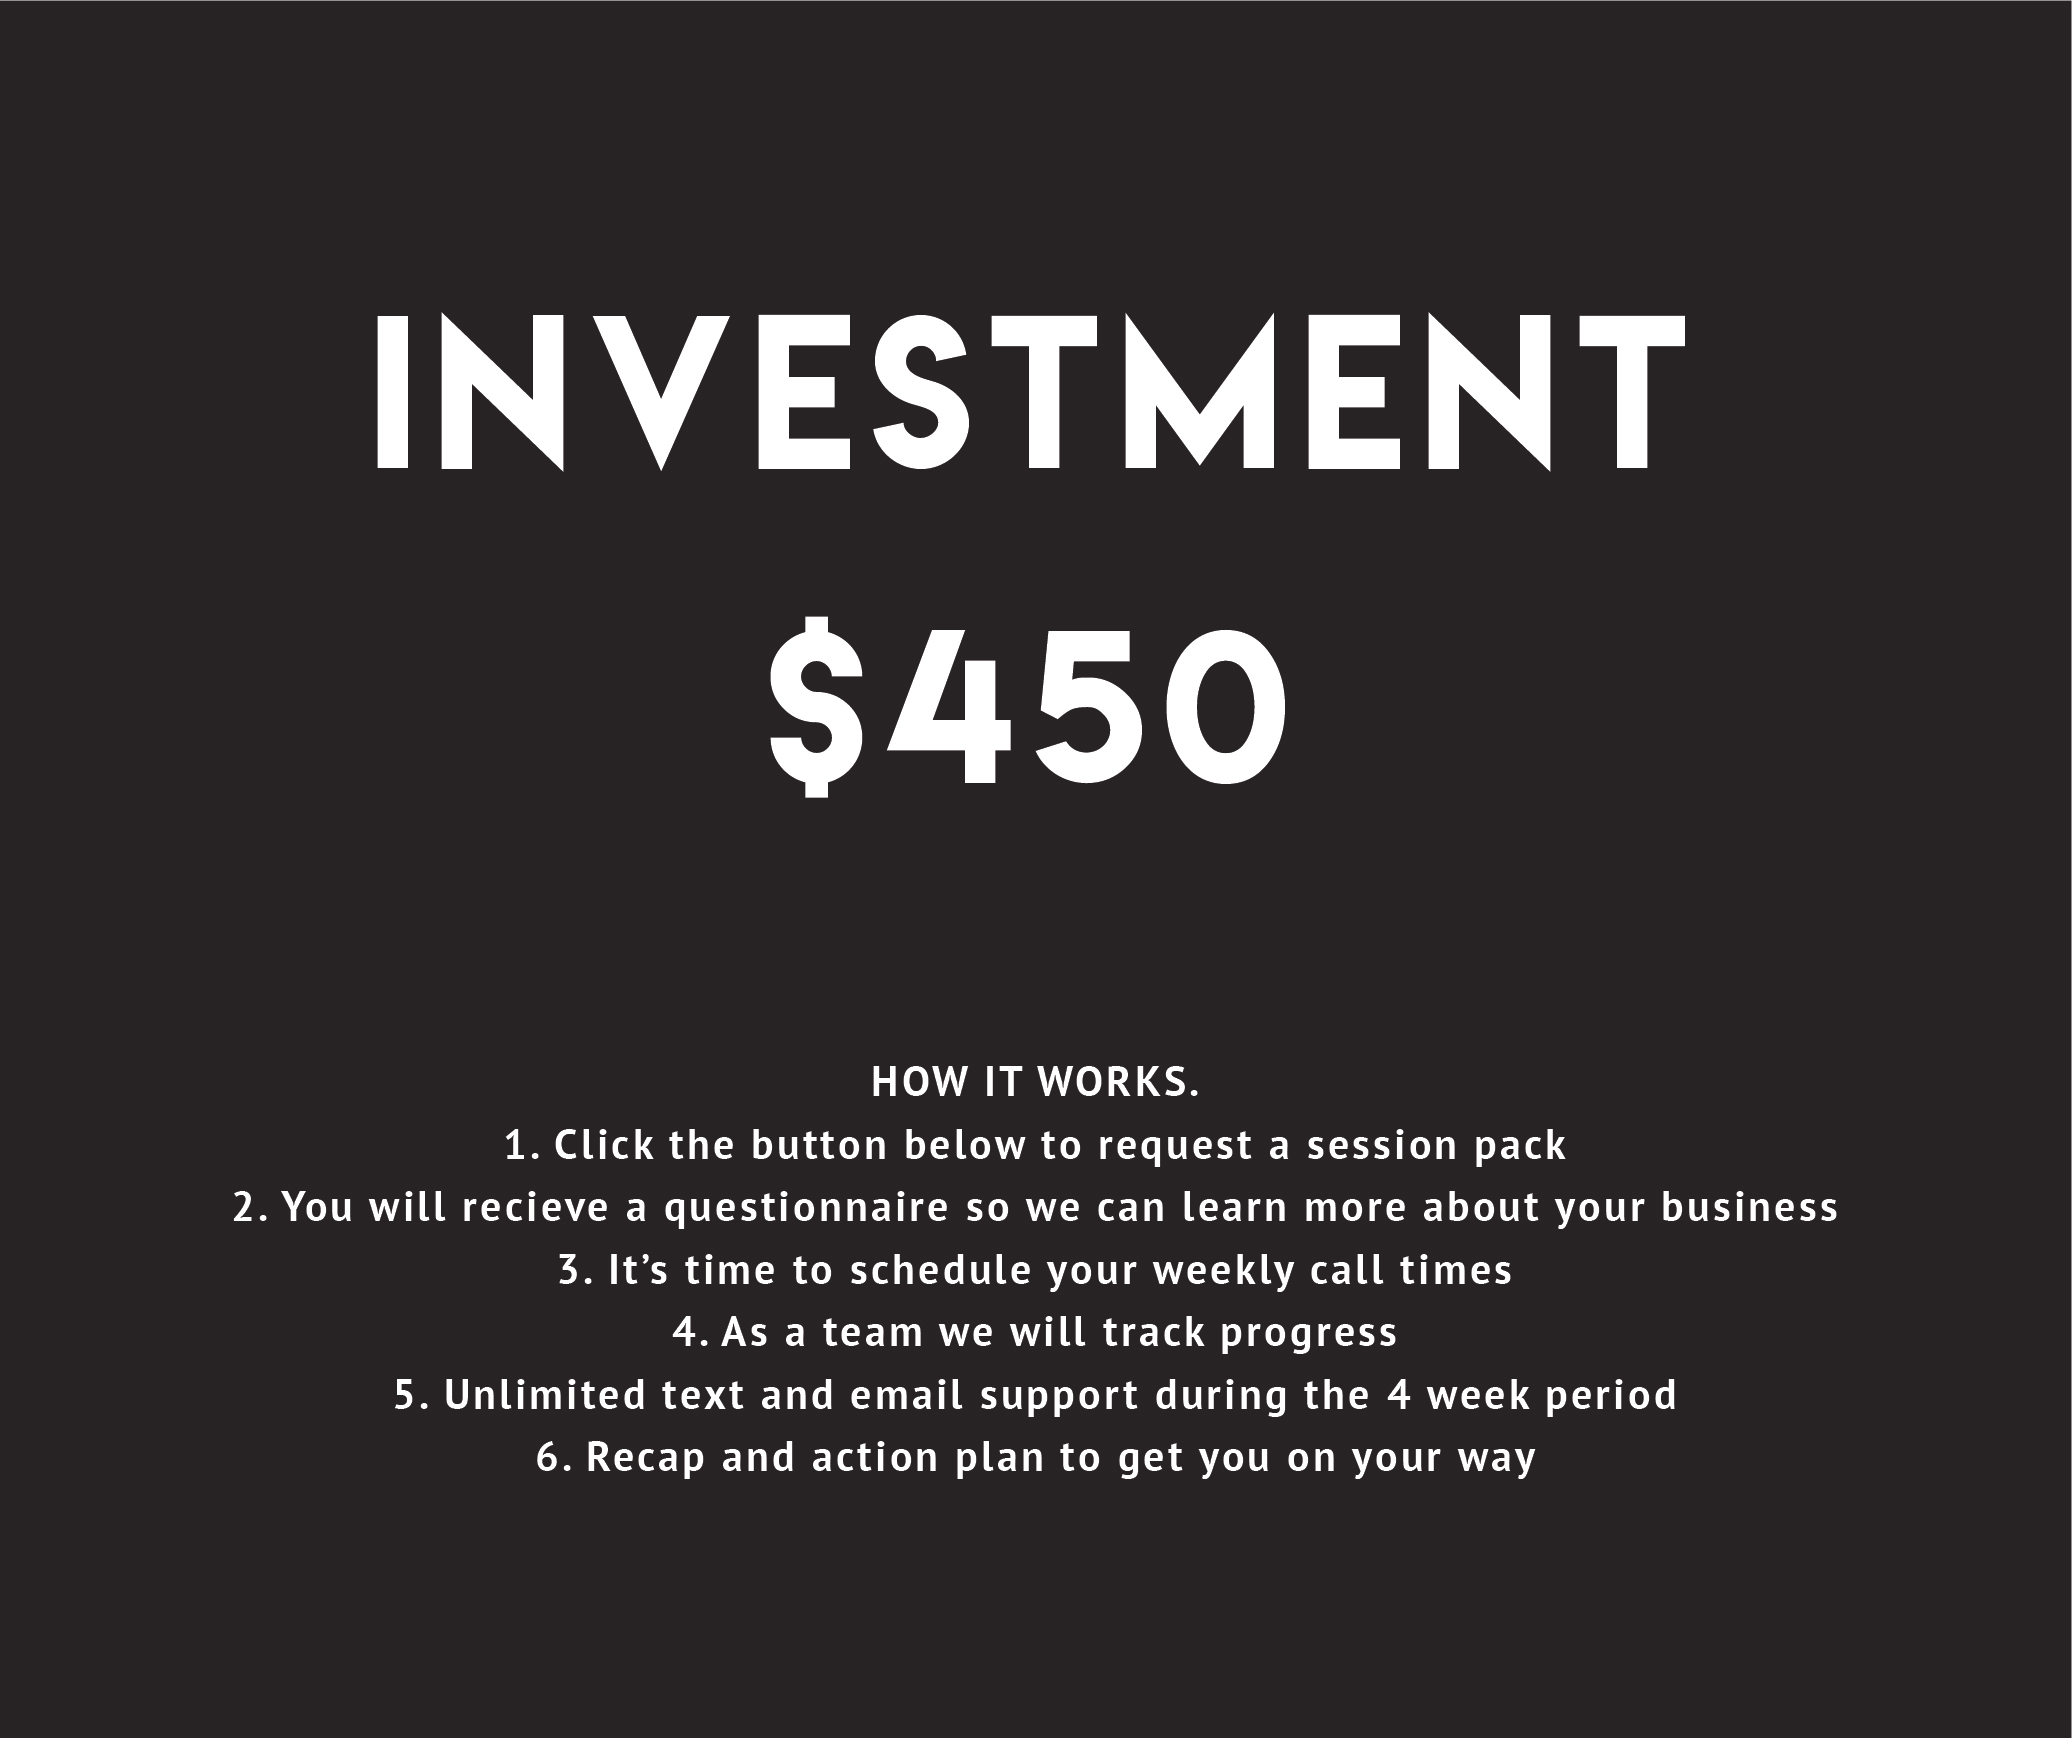 invest.jpg